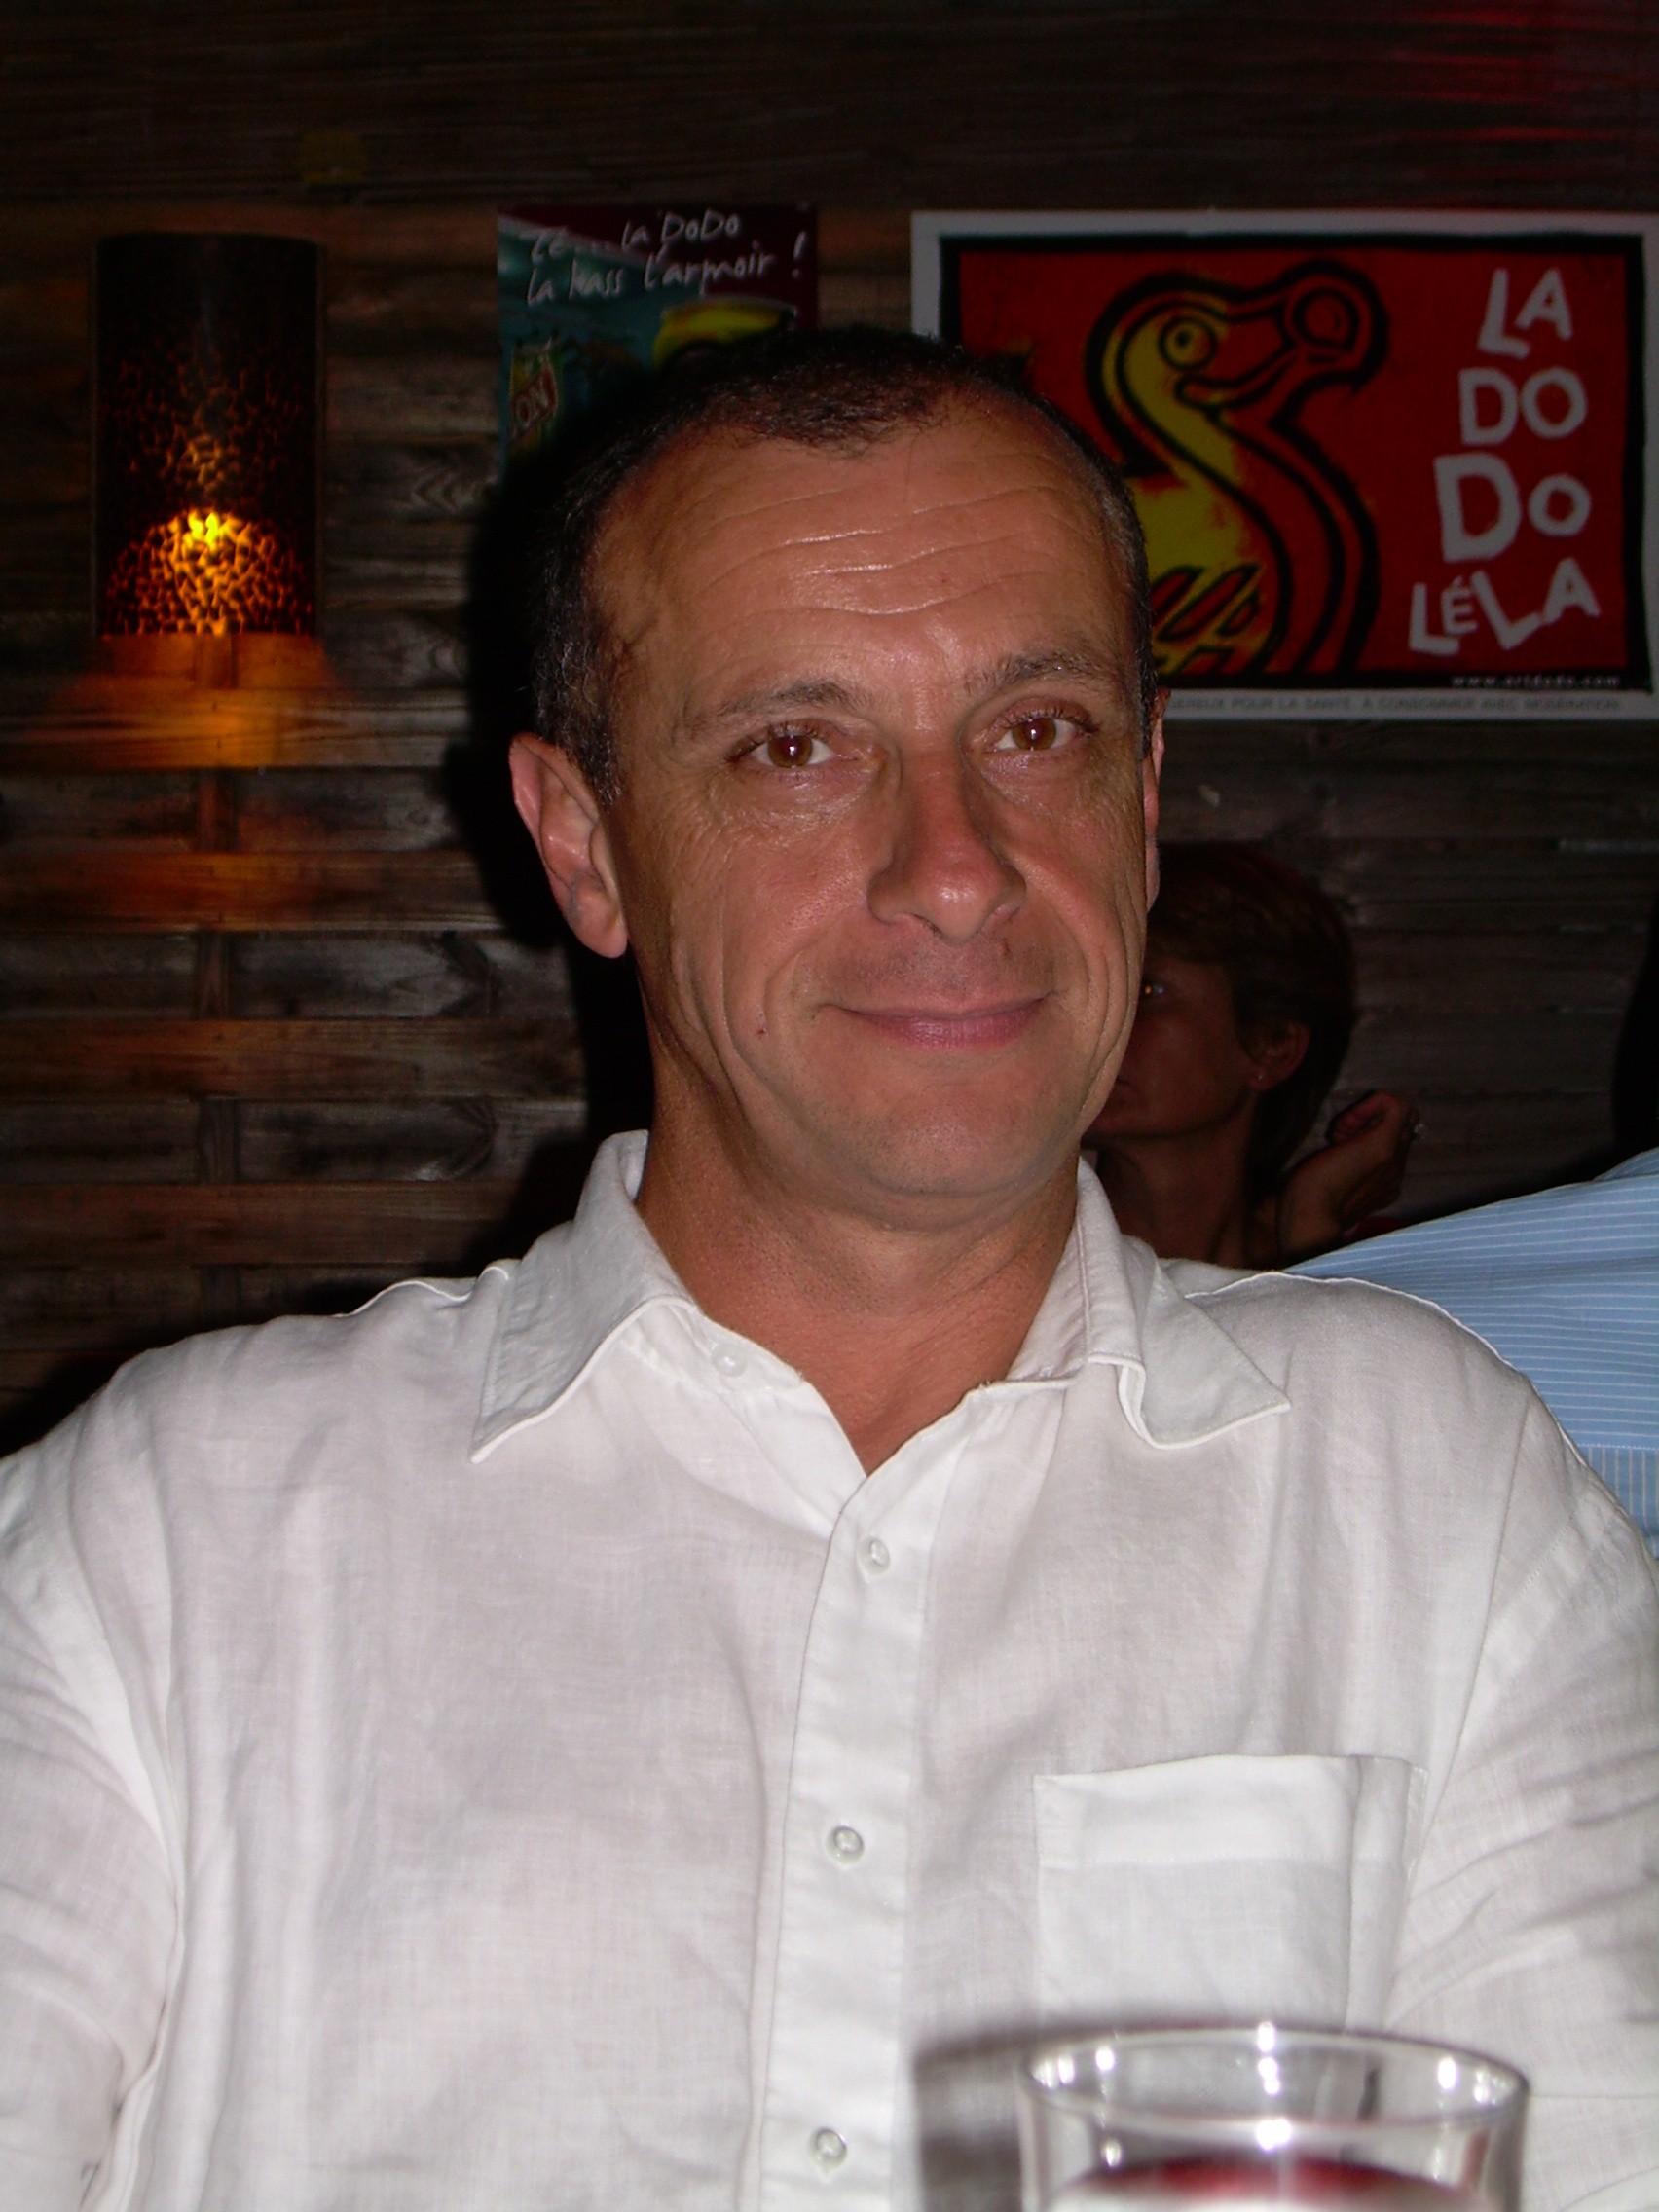 Jacques La Mer